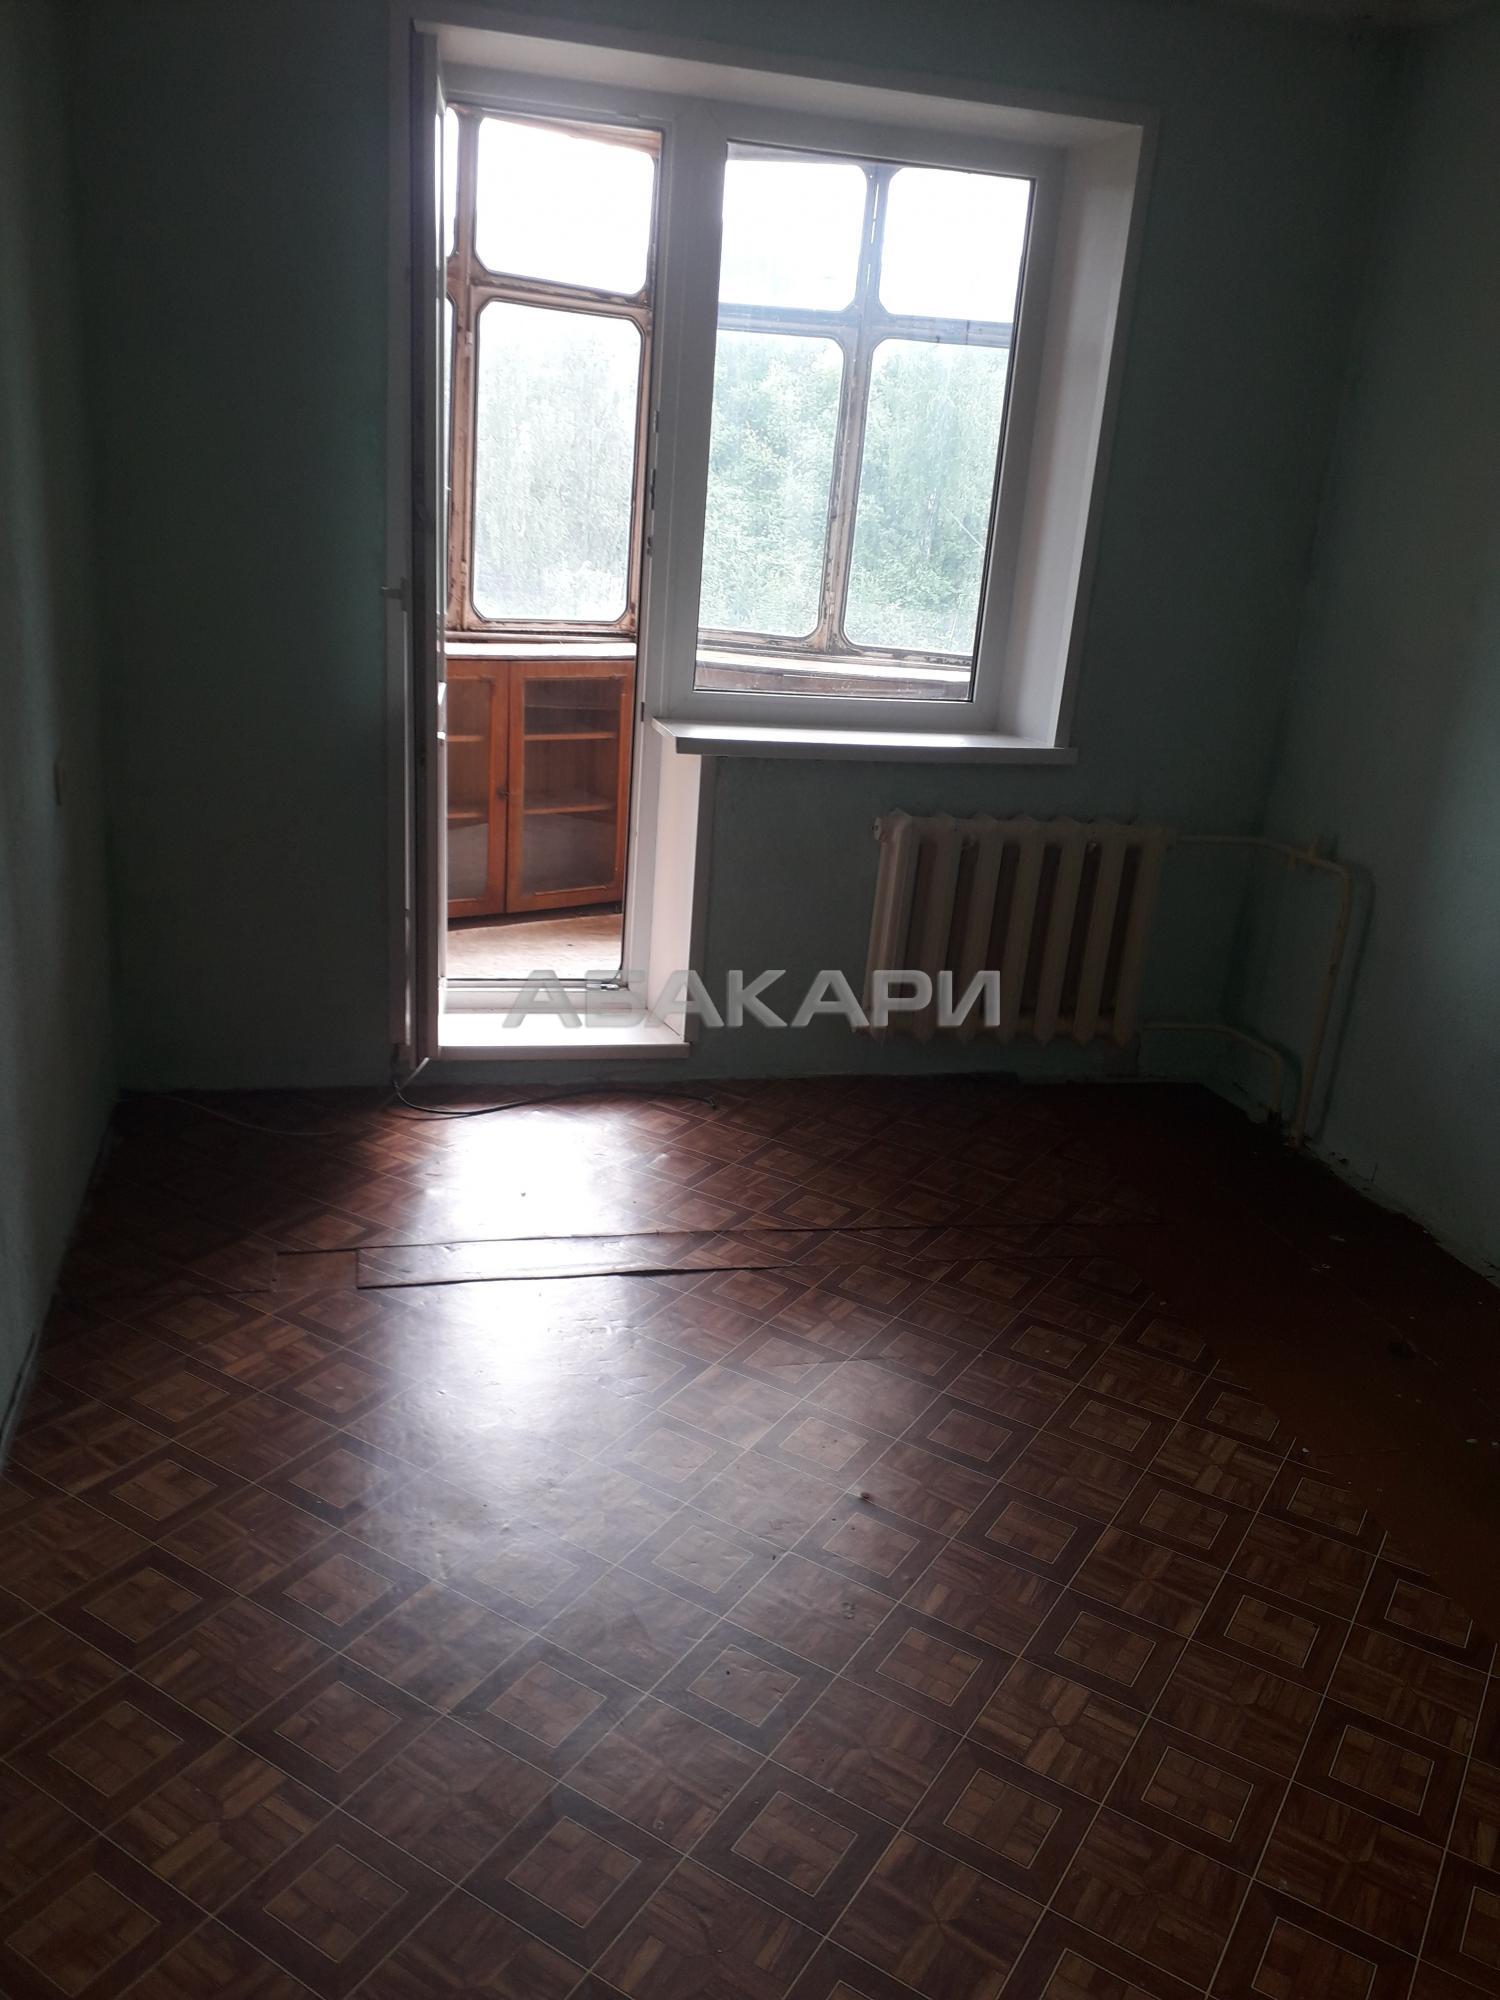 2к квартира улица Верхняя, 5Б | 12000 | аренда в Красноярске фото 5